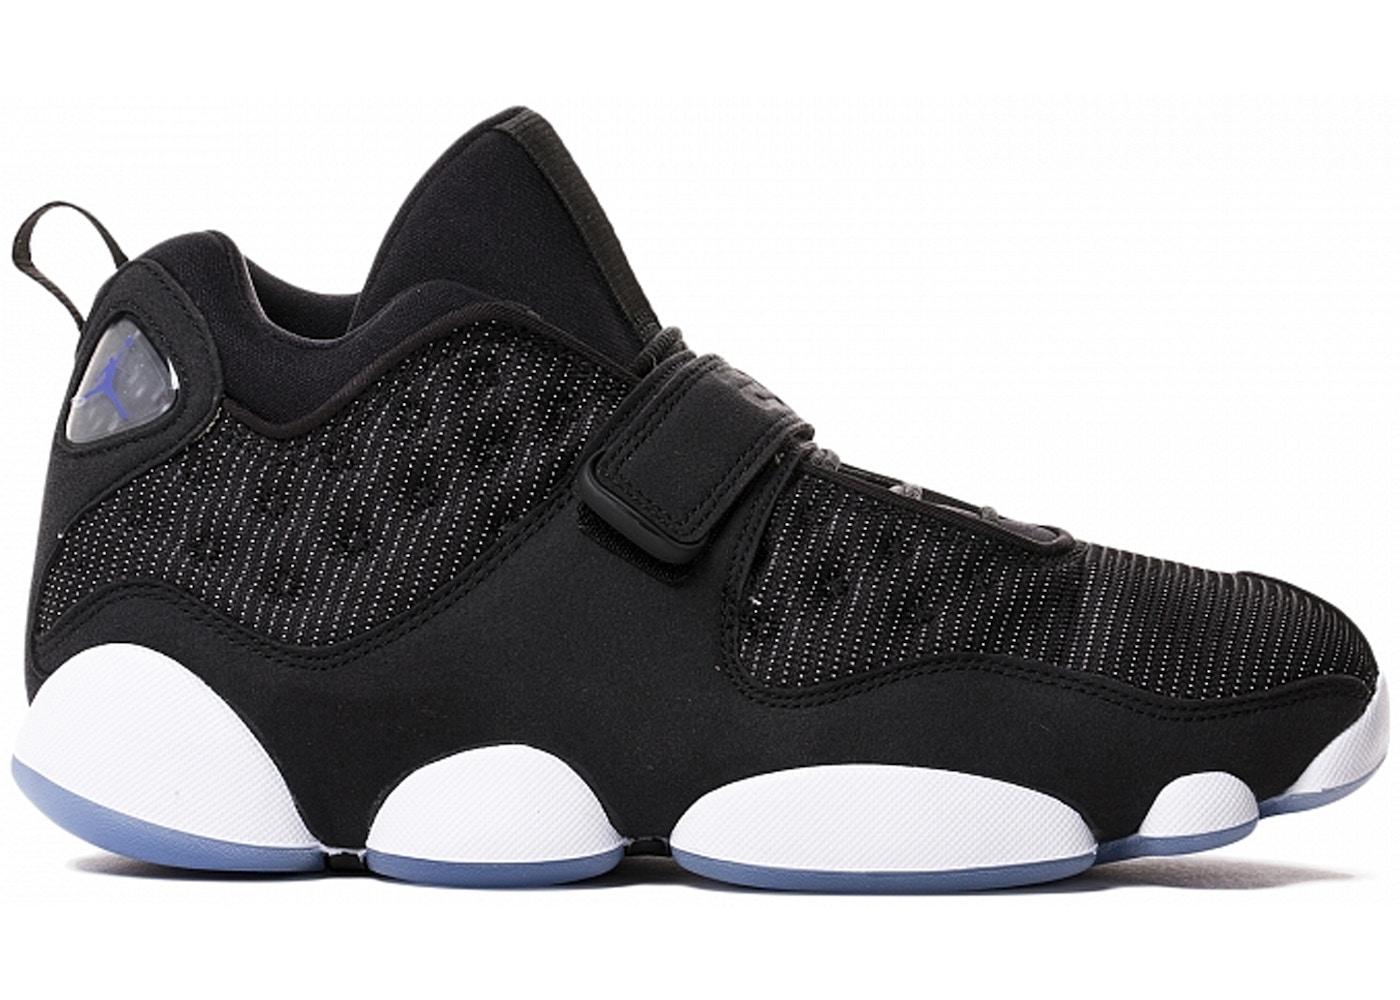 online retailer 221fc 5de3c Jordan Black Cat Black Concord